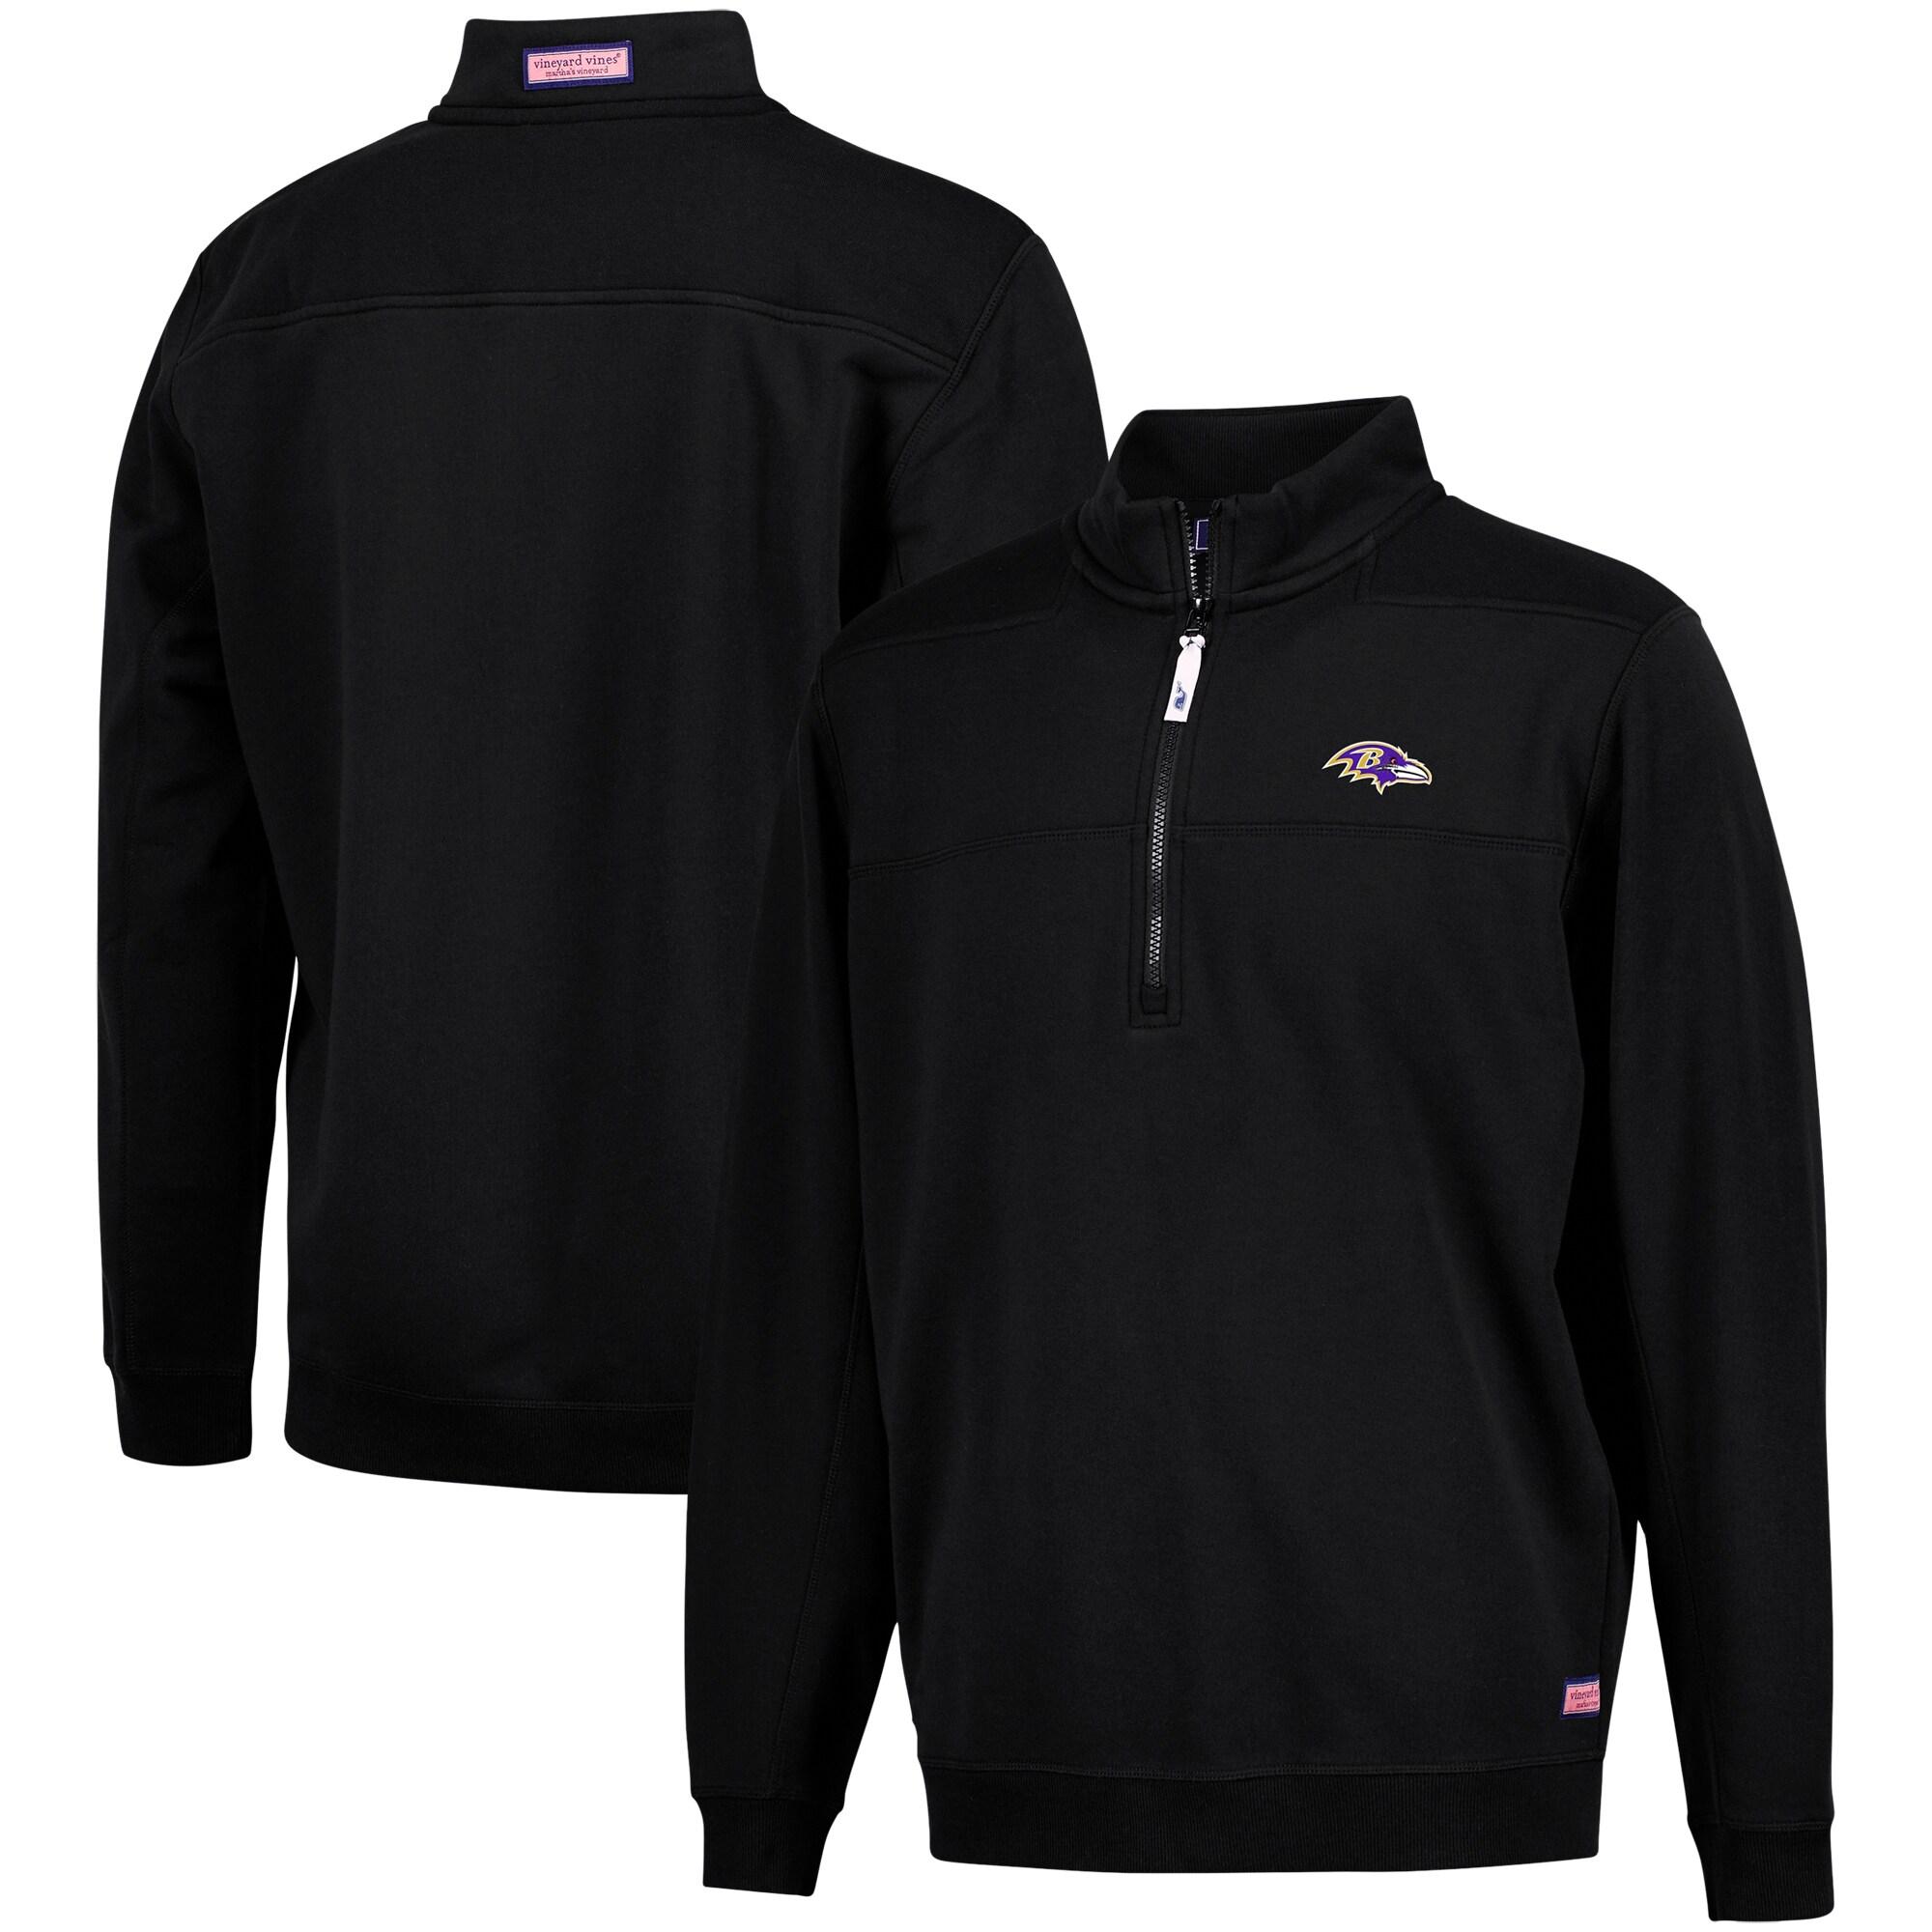 Baltimore Ravens Vineyard Vines Collegiate Shep Shirt Quarter-Zip Pullover Jacket - Black